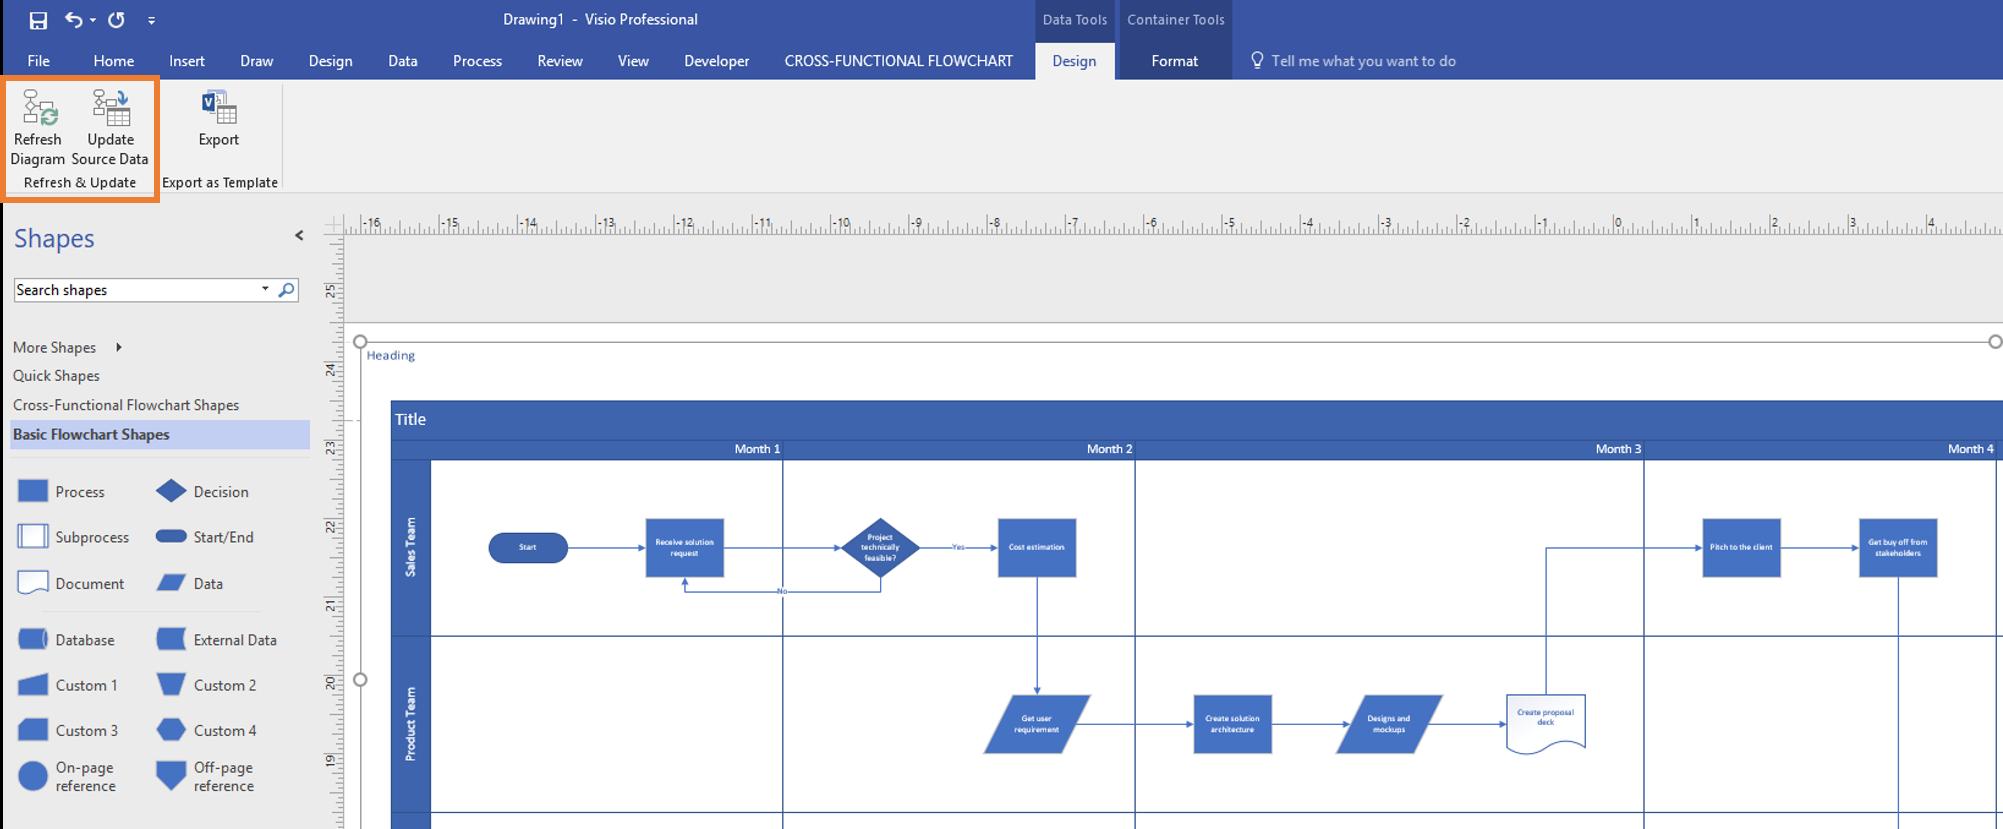 Demo Visio Process Diagrams DIY Enthusiasts Wiring Diagrams - Visio process map template